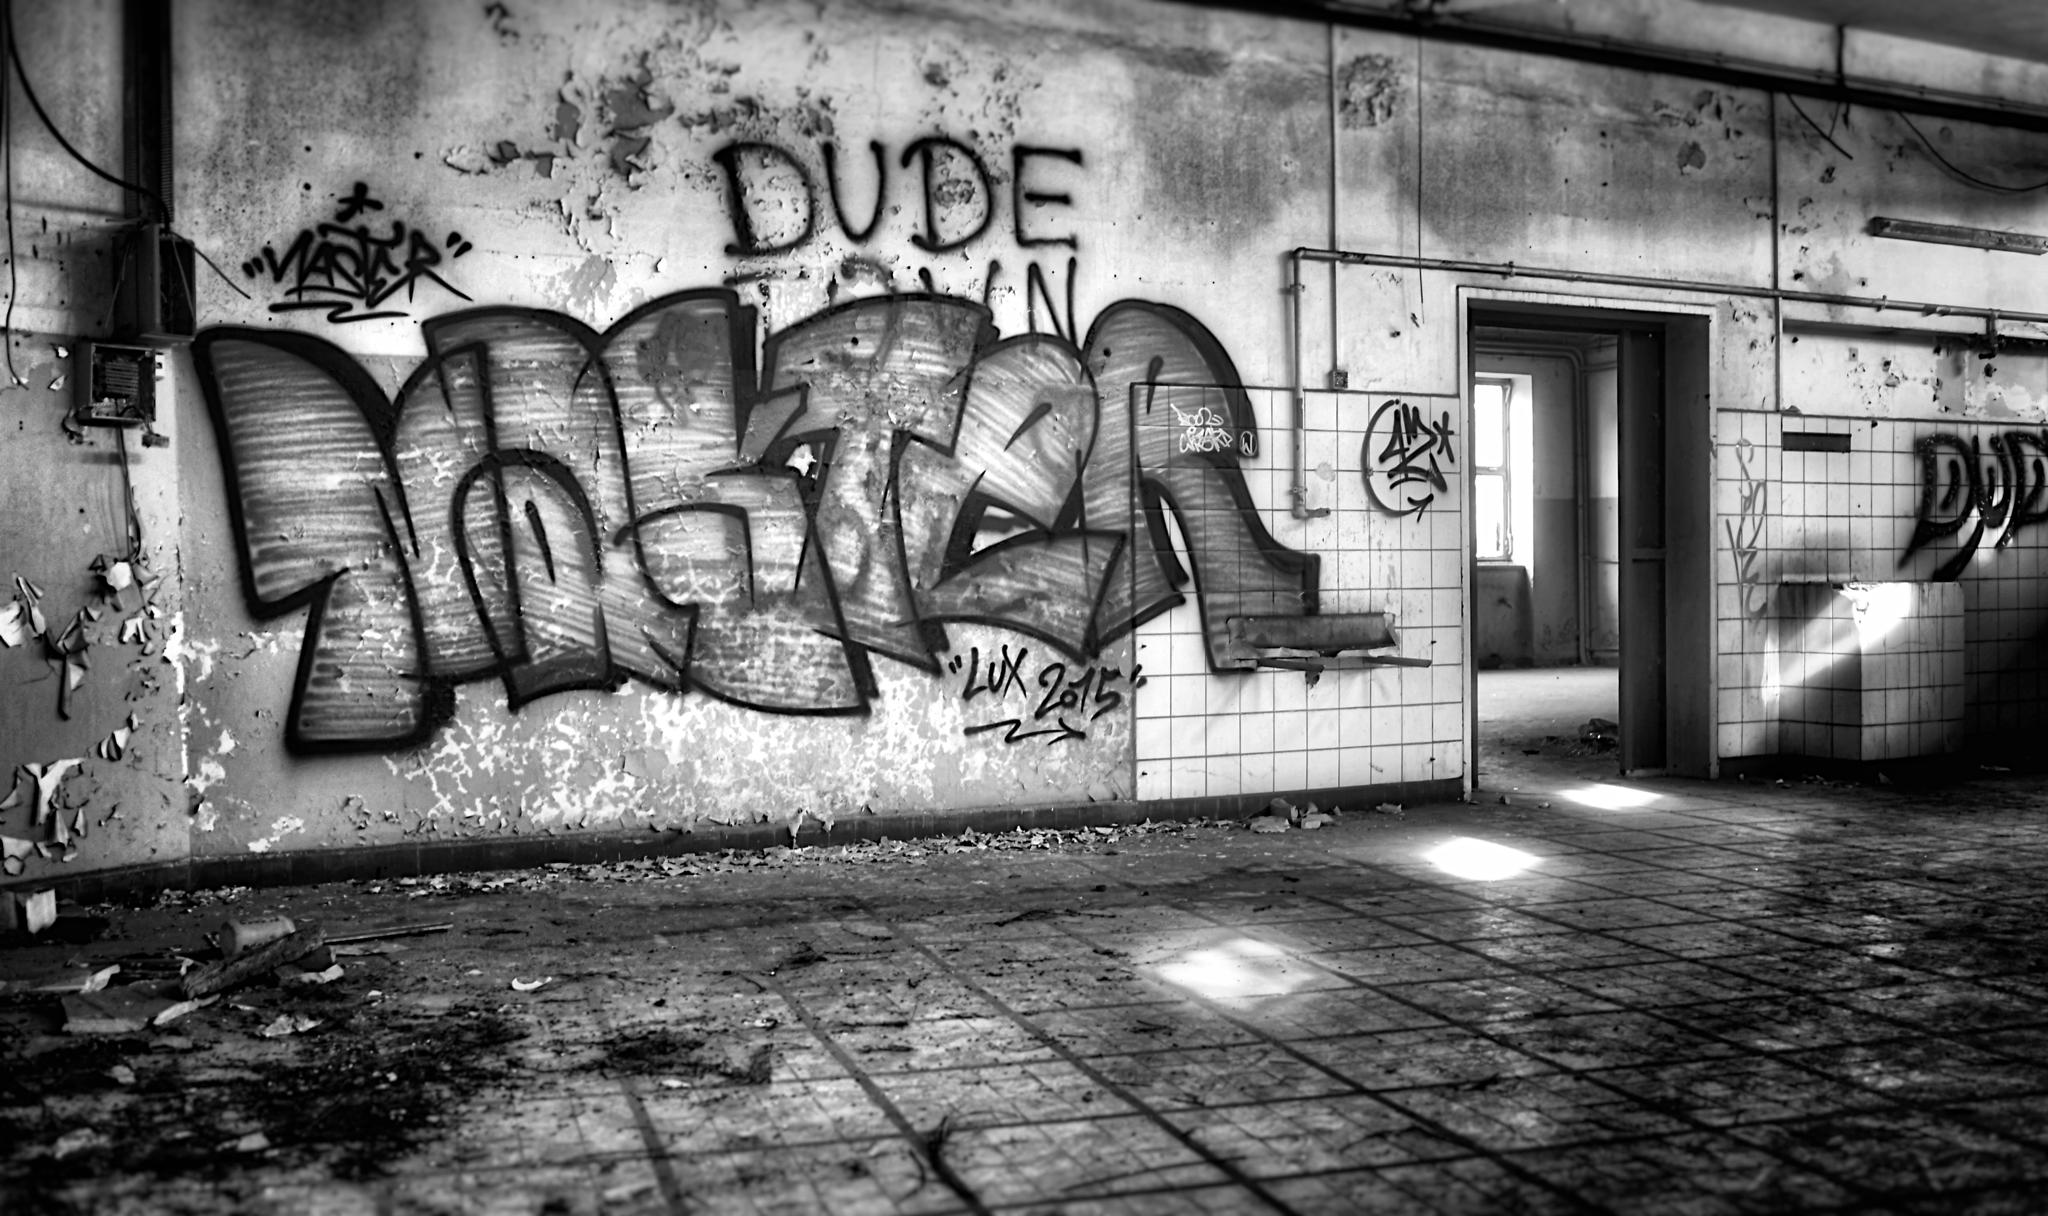 ... dude by Carlo Scherer